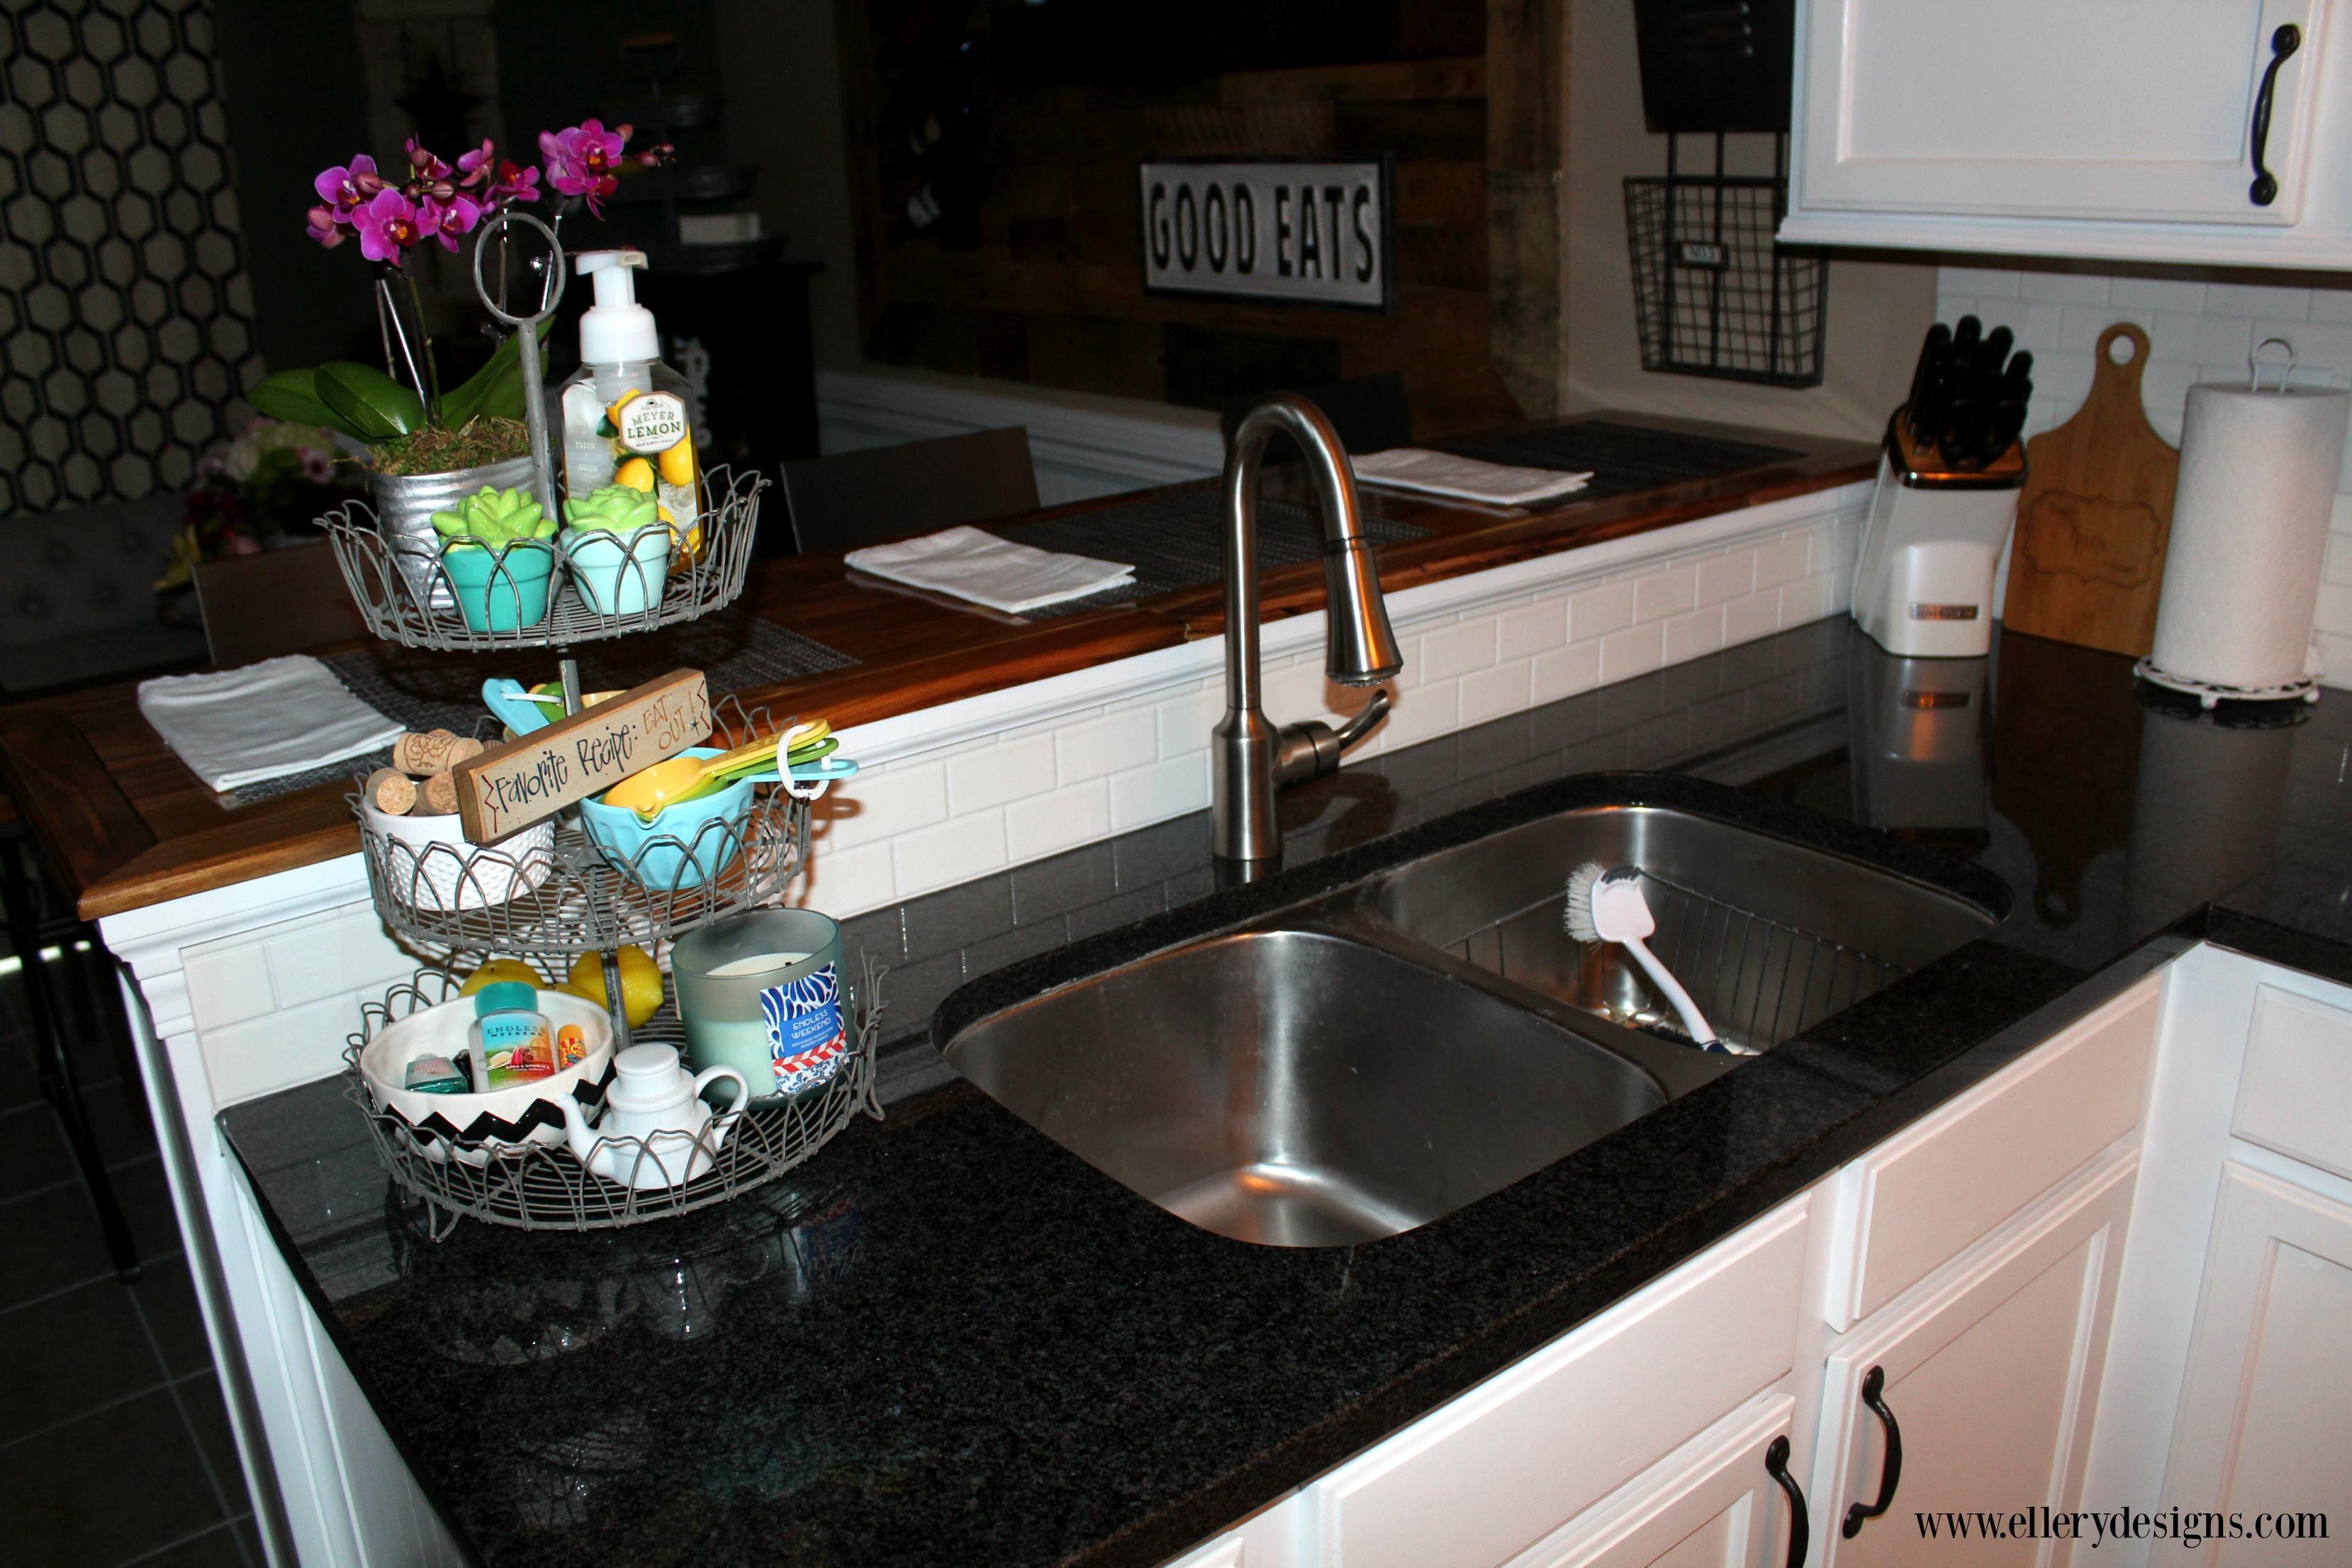 Beautiful White Industrial Farmhouse Kitchen Makeover - ElleryDesigns.com